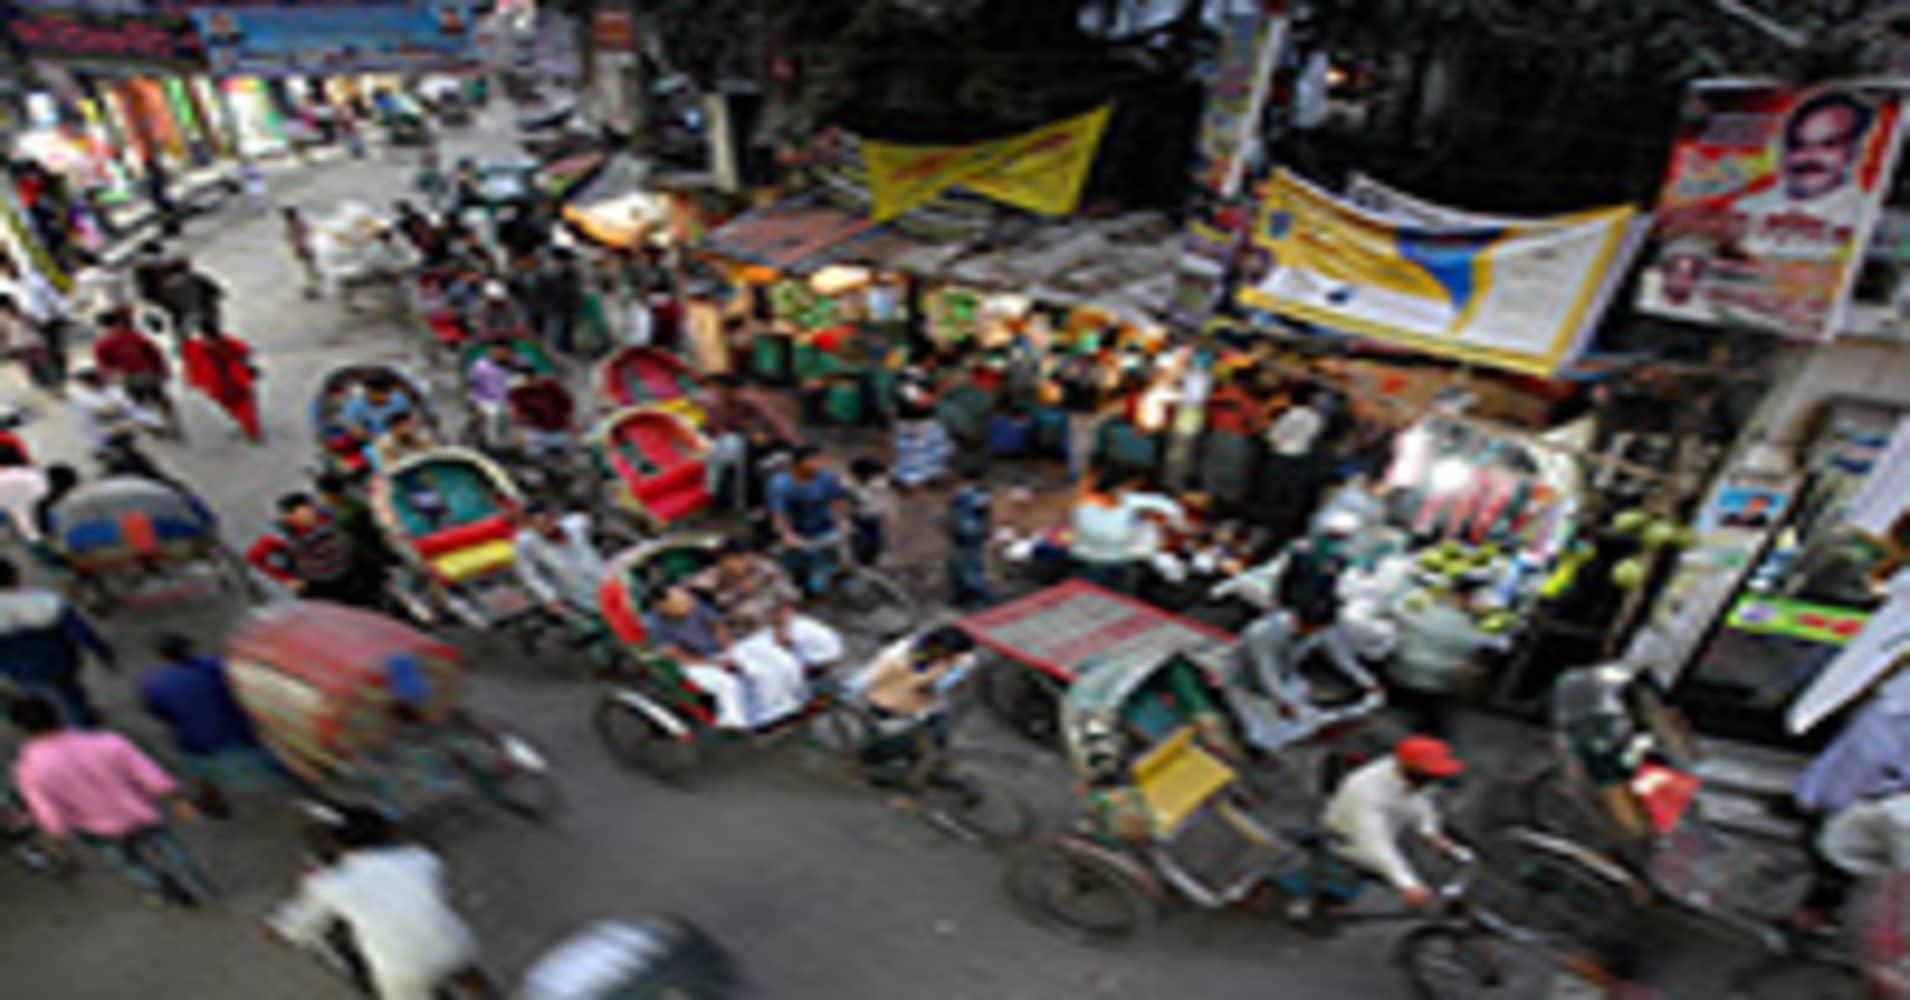 Pedestrians and rickshaws move along a street in the Old Market of Dhaka, Bangladesh.